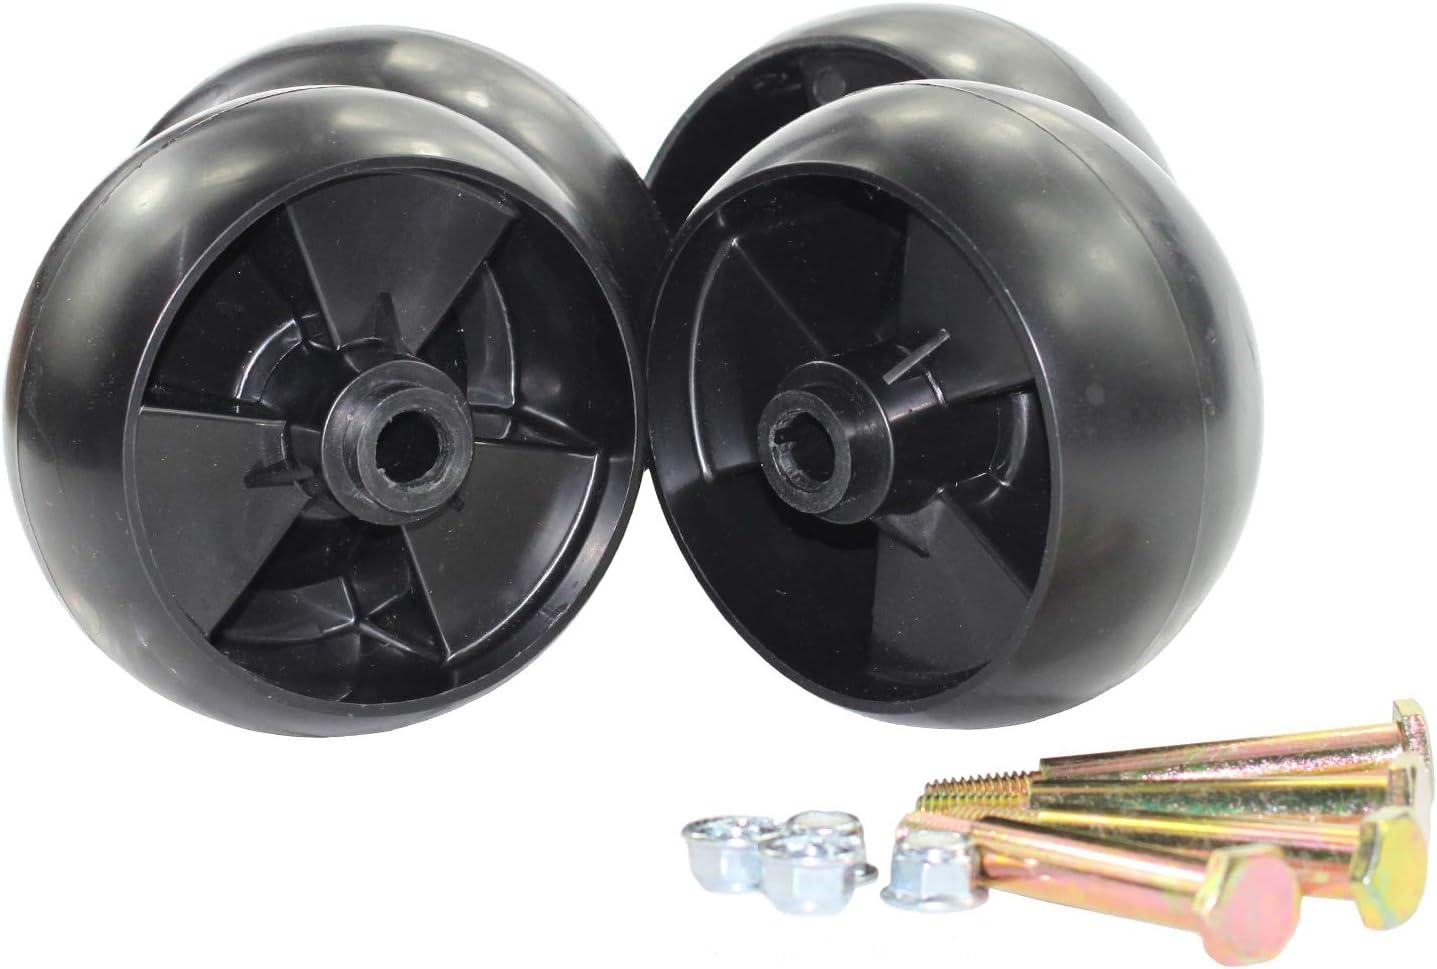 Antanker Replacement for Deck Wheels MTD 734-04155 Toro 112-0677 5